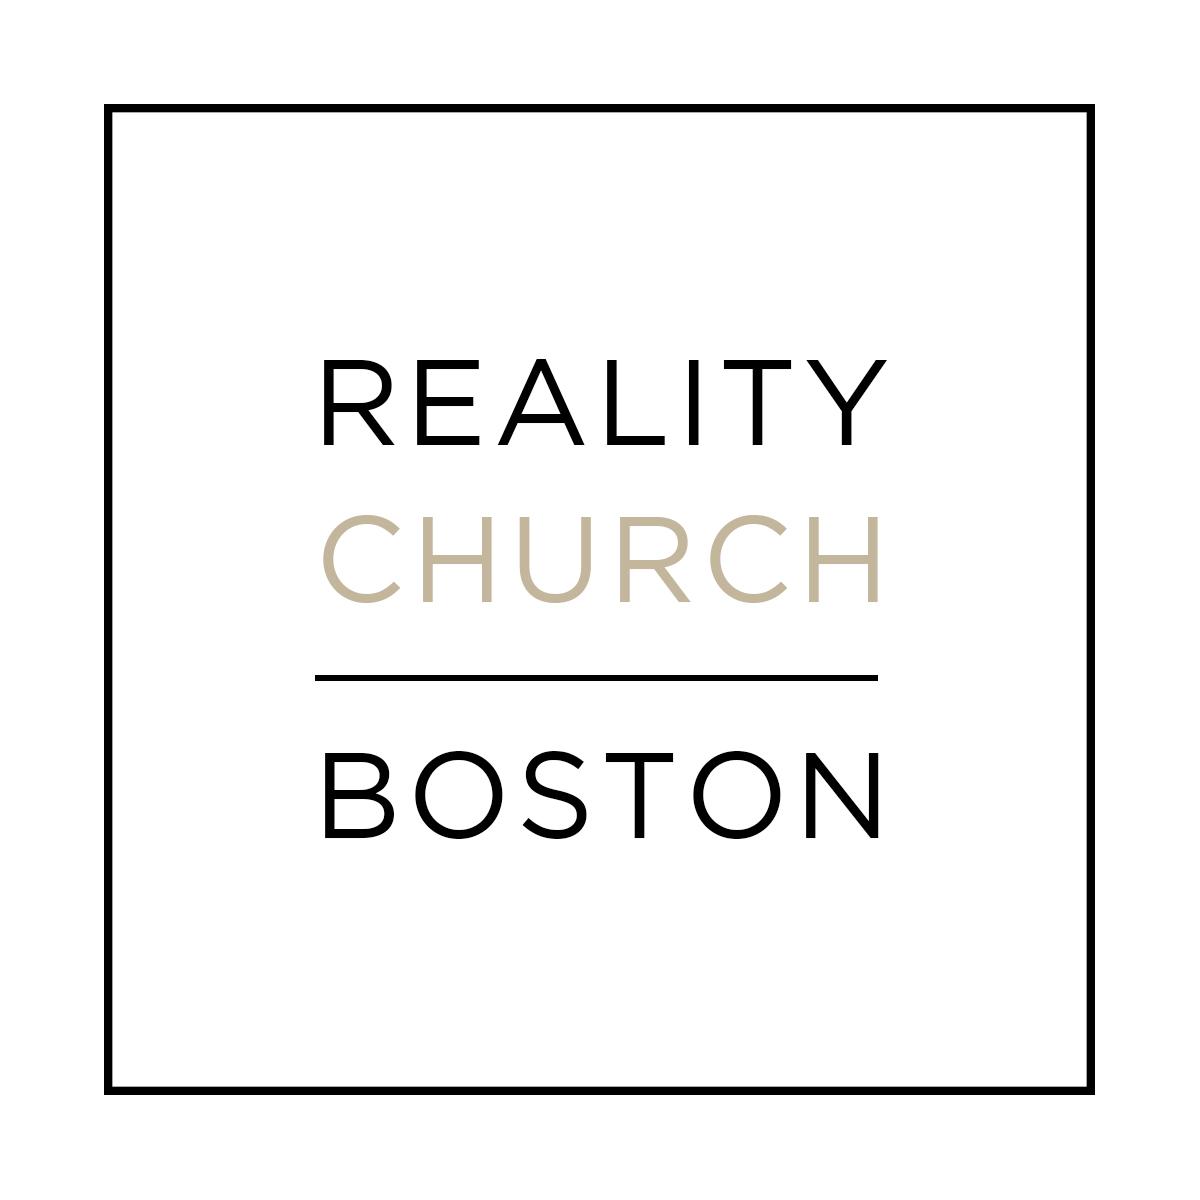 reality church boston biblical teachings reality church boston